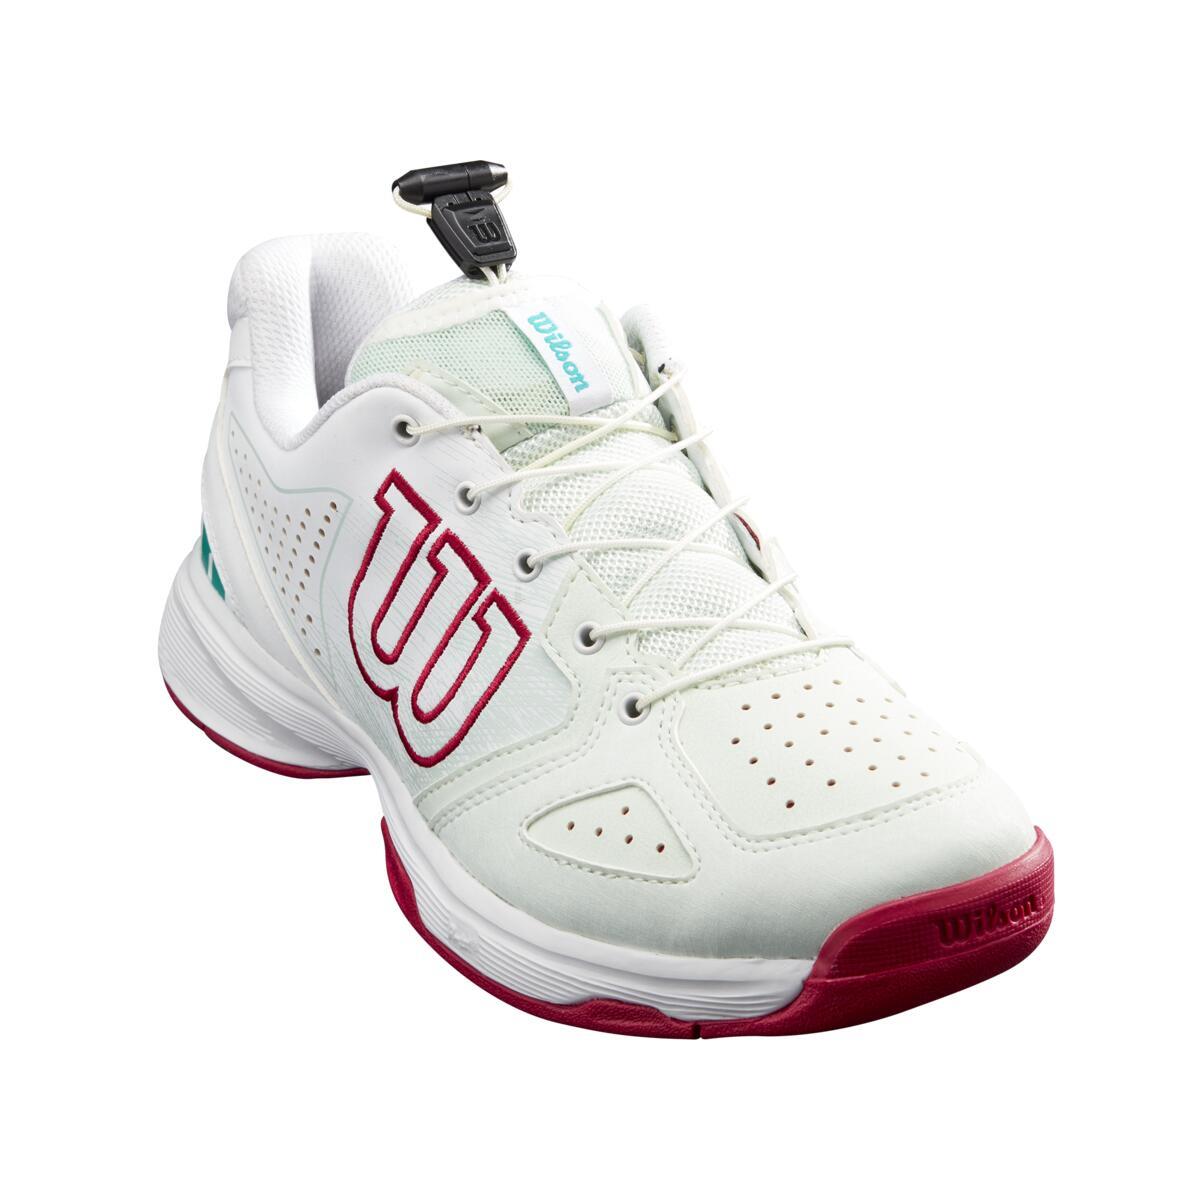 Wilson Kaos QL Junior Tennis Shoe – Soothing Sea/White/Sangria